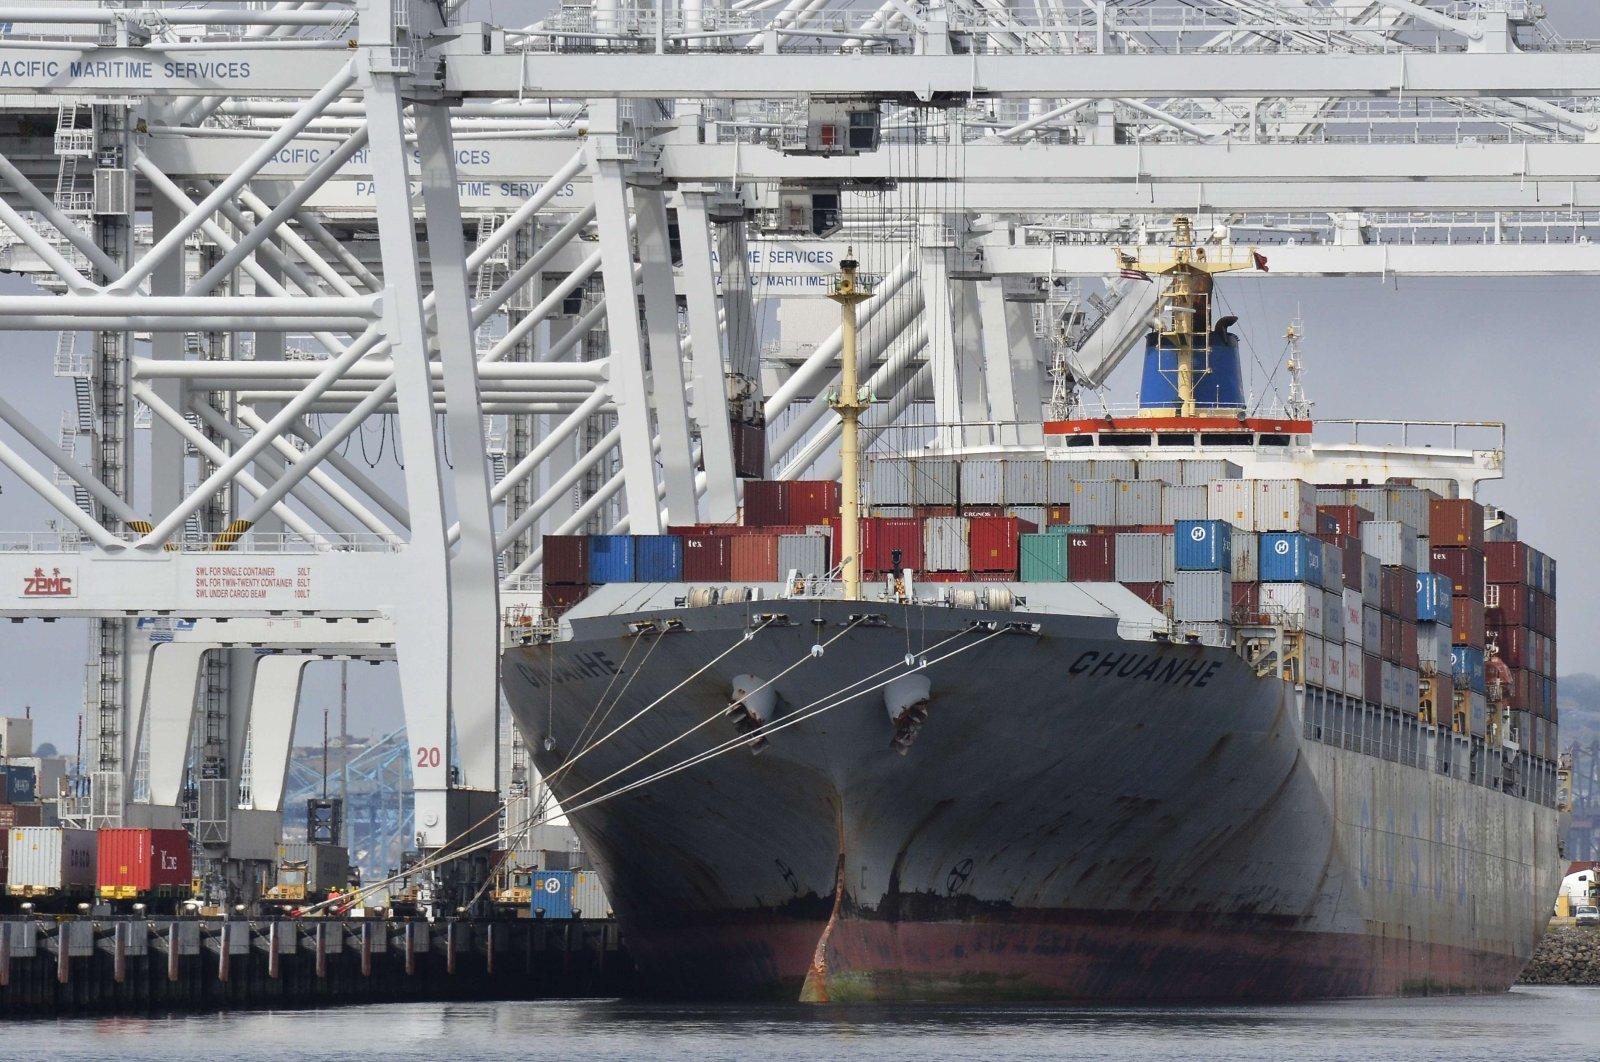 A cargo ship docks at Long Beach Harbor, California, U.S., May 6, 2015. (AFP Photo)